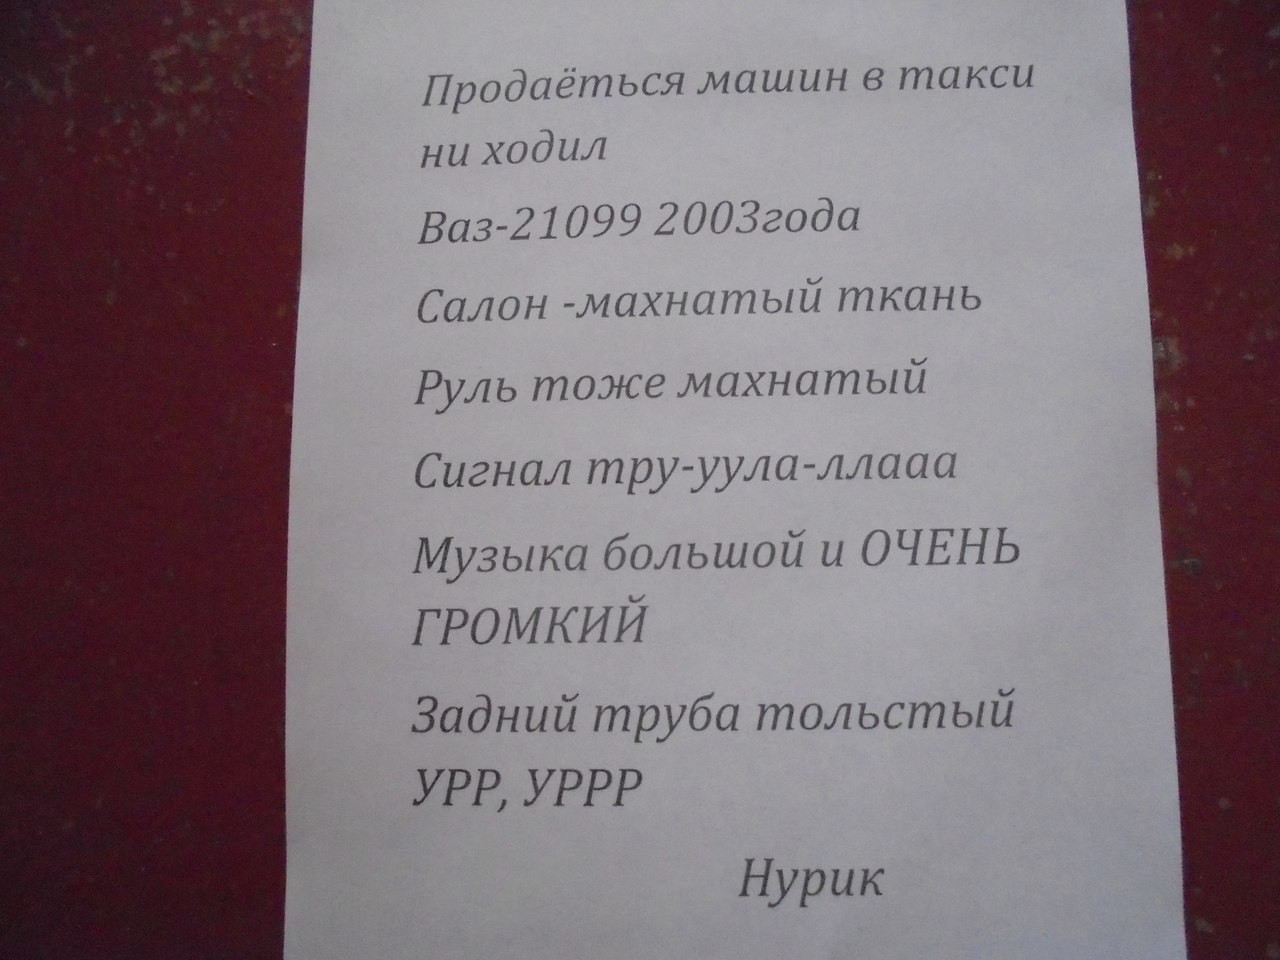 https://cs7057.vk.me/c543100/v543100366/4c0f3/E-hliMUQf9A.jpg